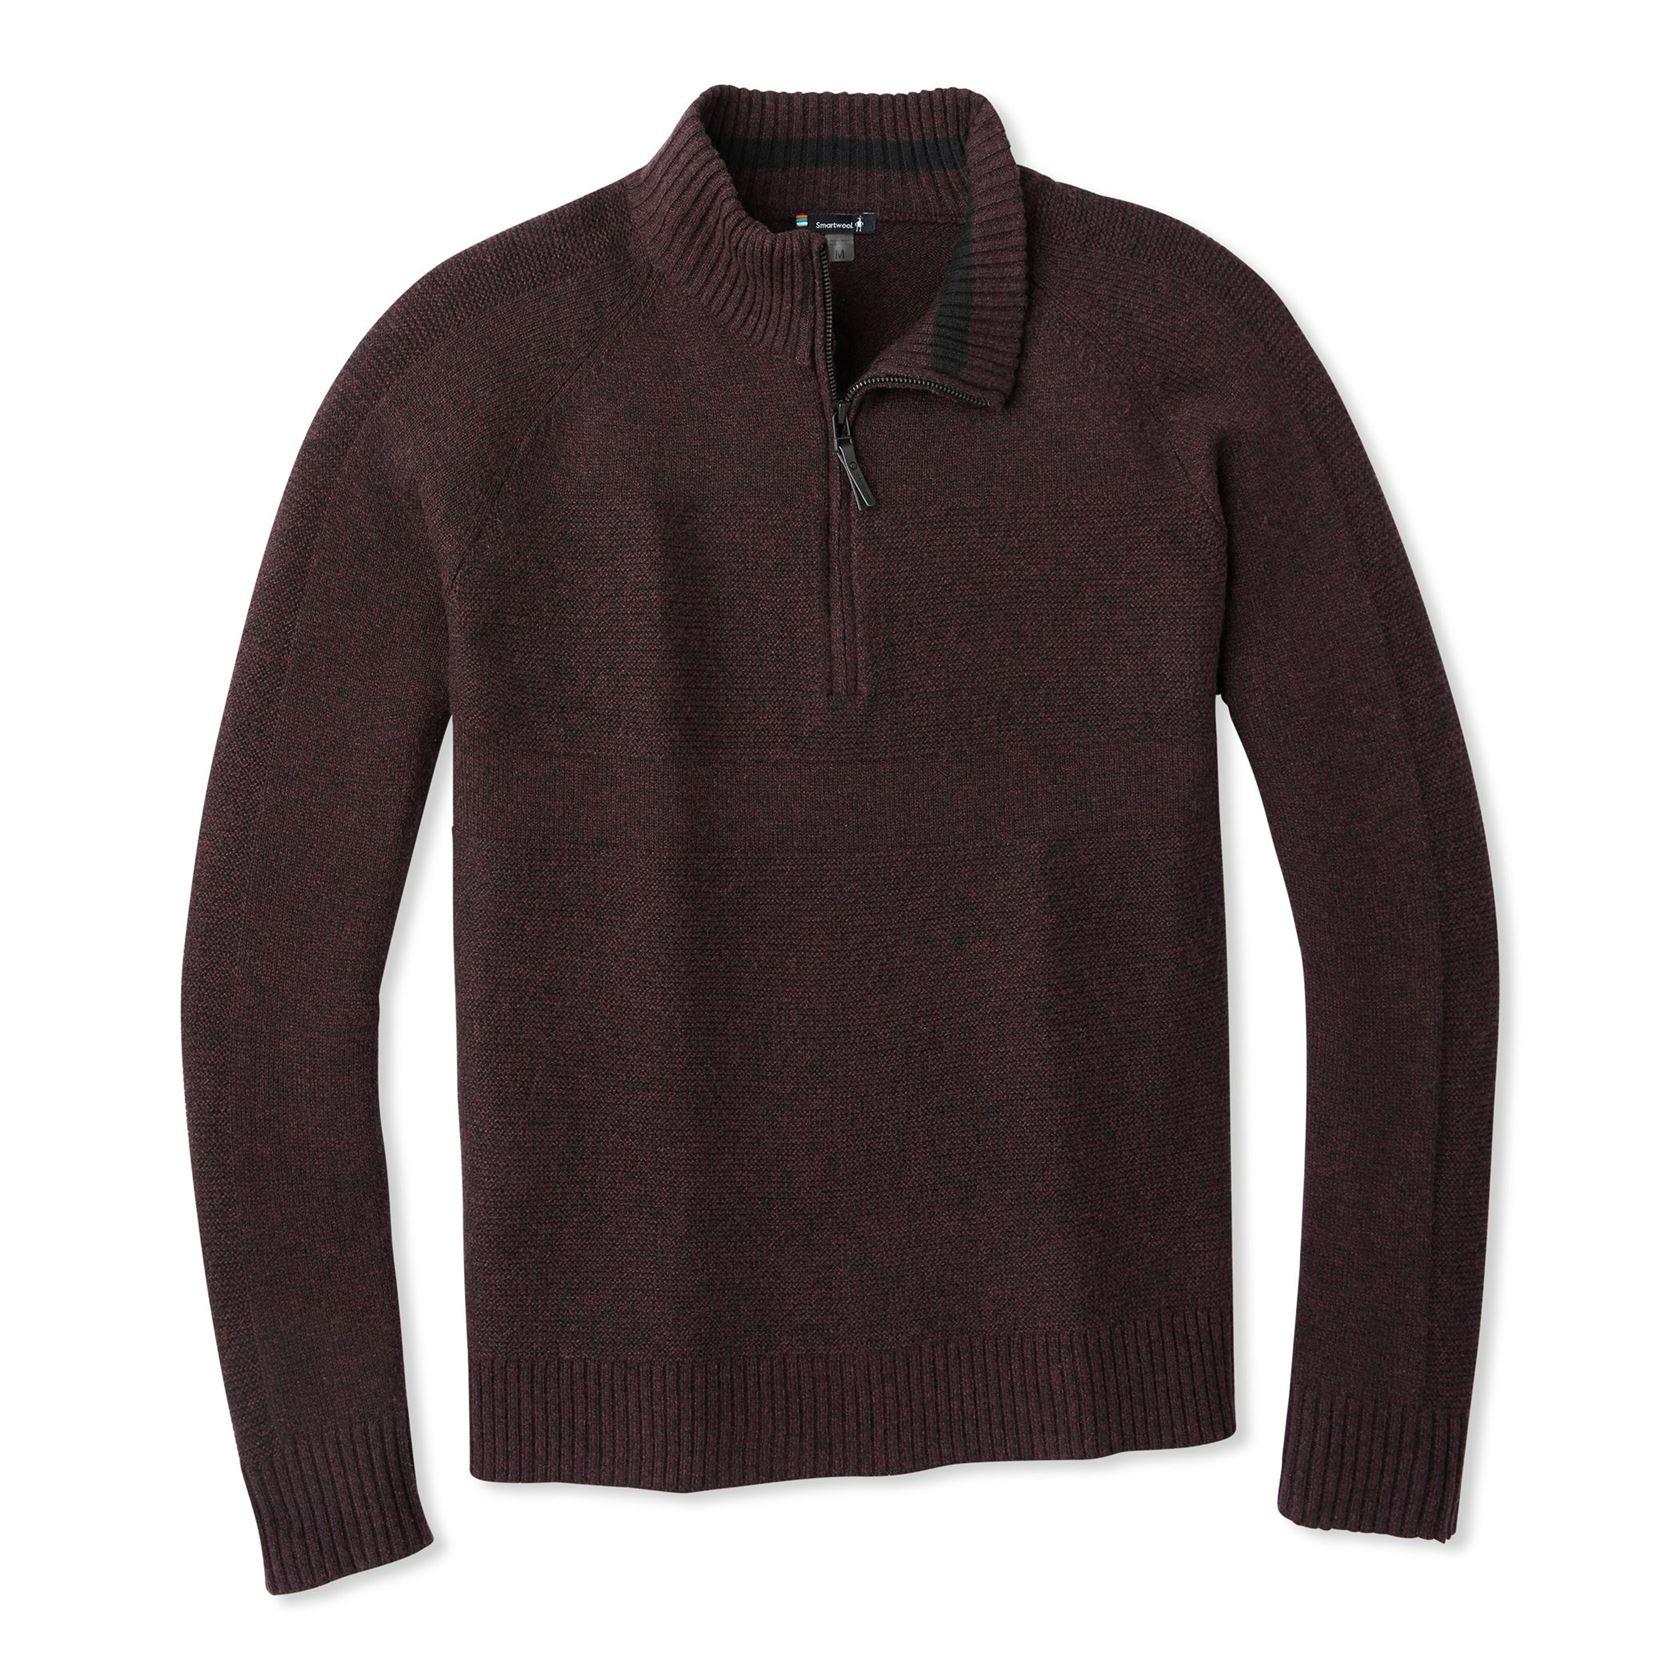 Ripple Ridge Half Zip Sweater - Men's